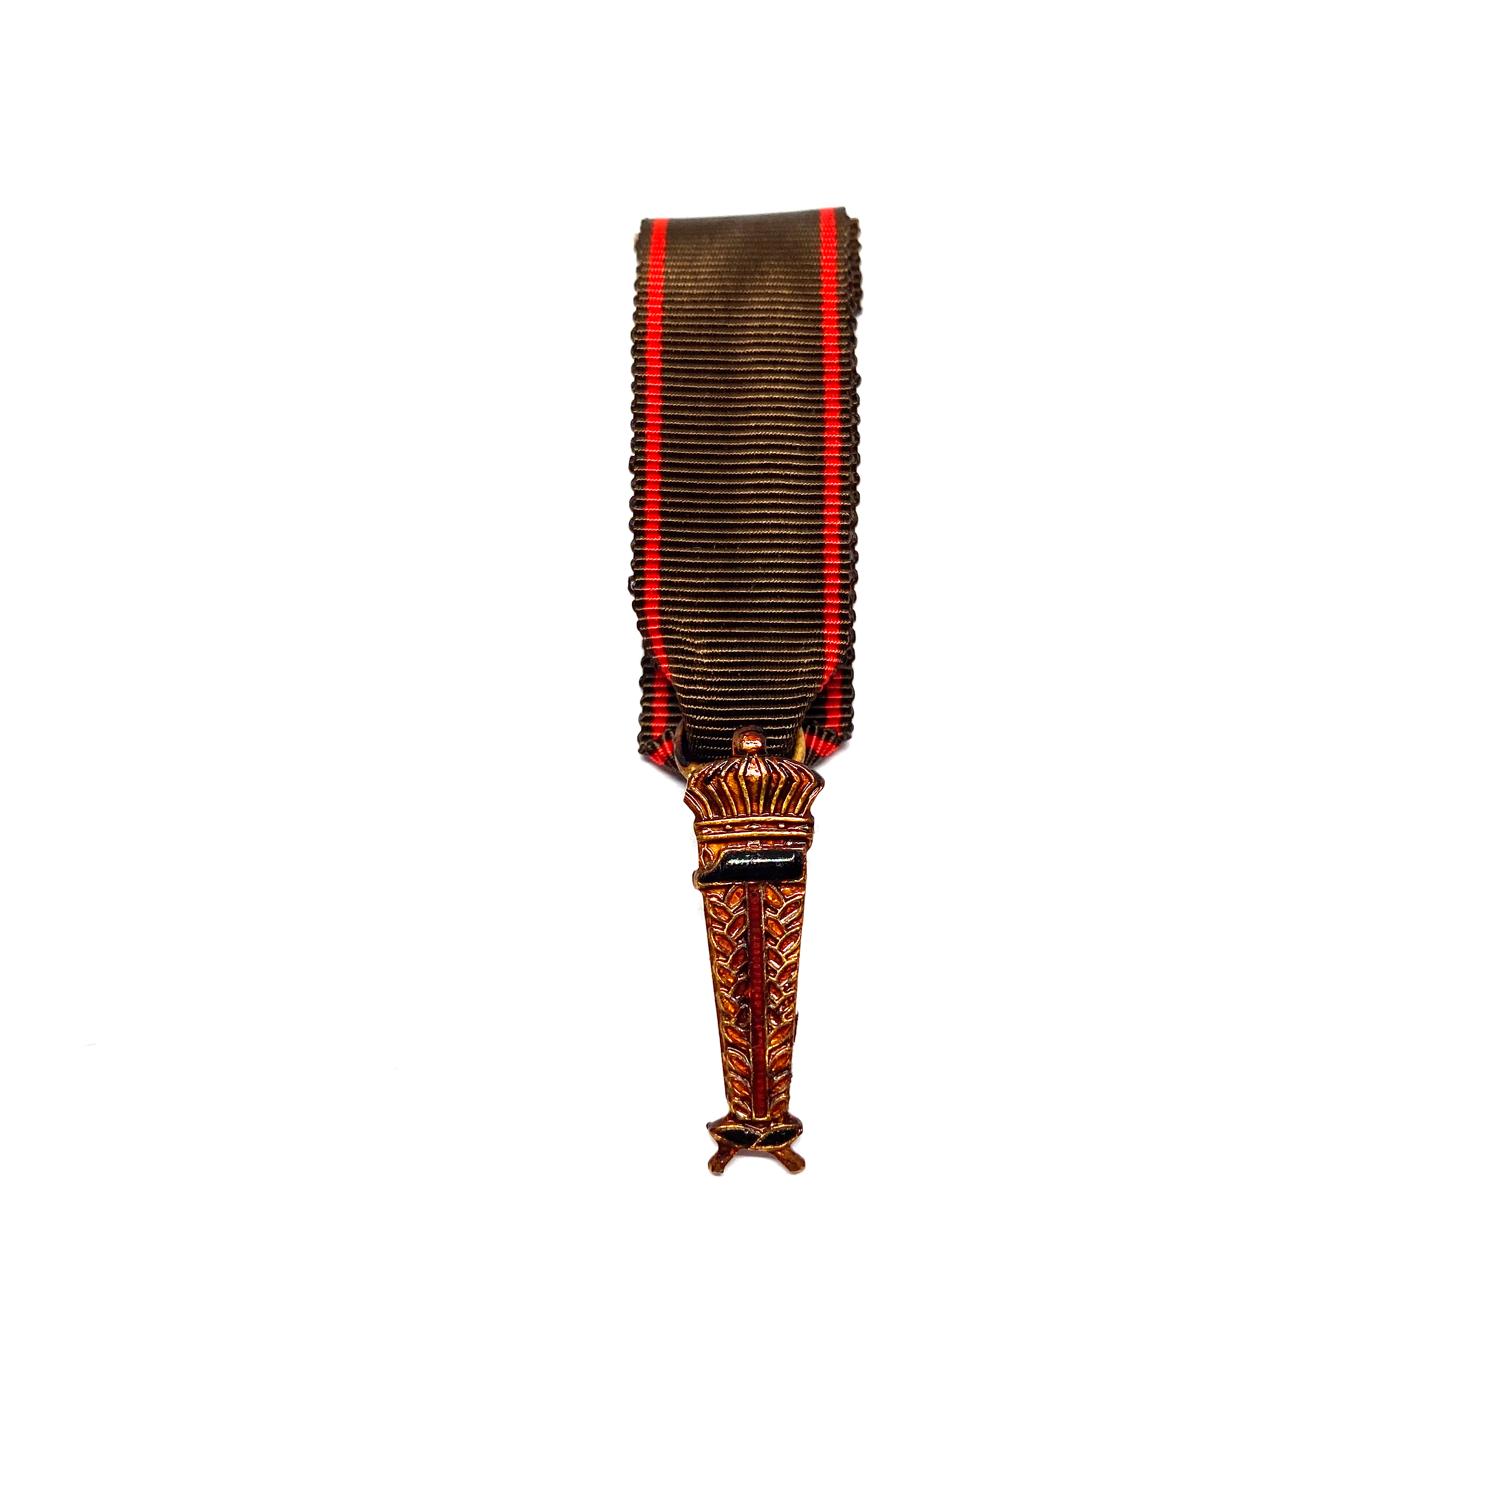 Bronze medal Laureate of Labour